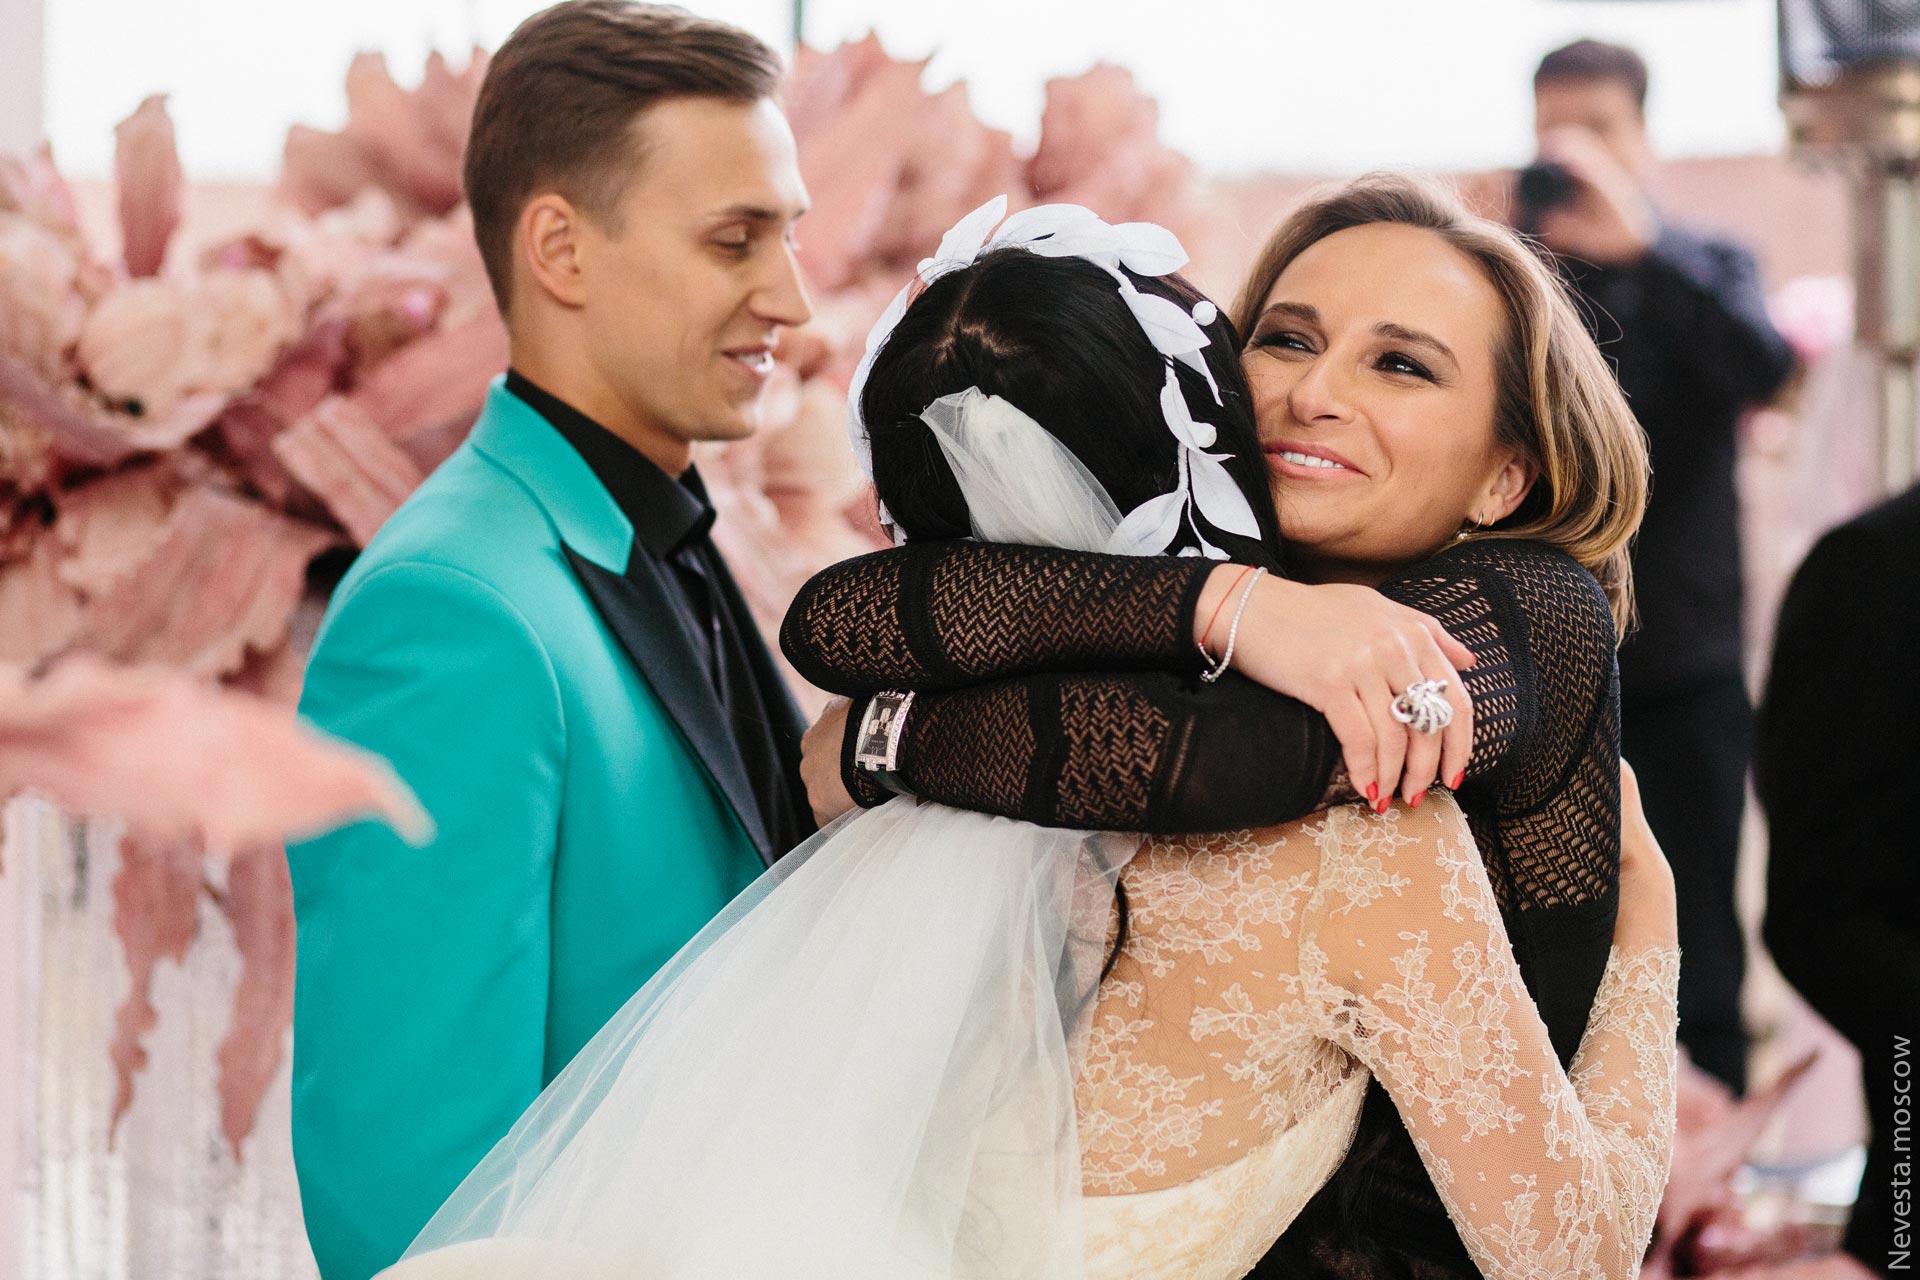 Свадьба Нелли Ермолаевой и Кирилла Андреева фото 35